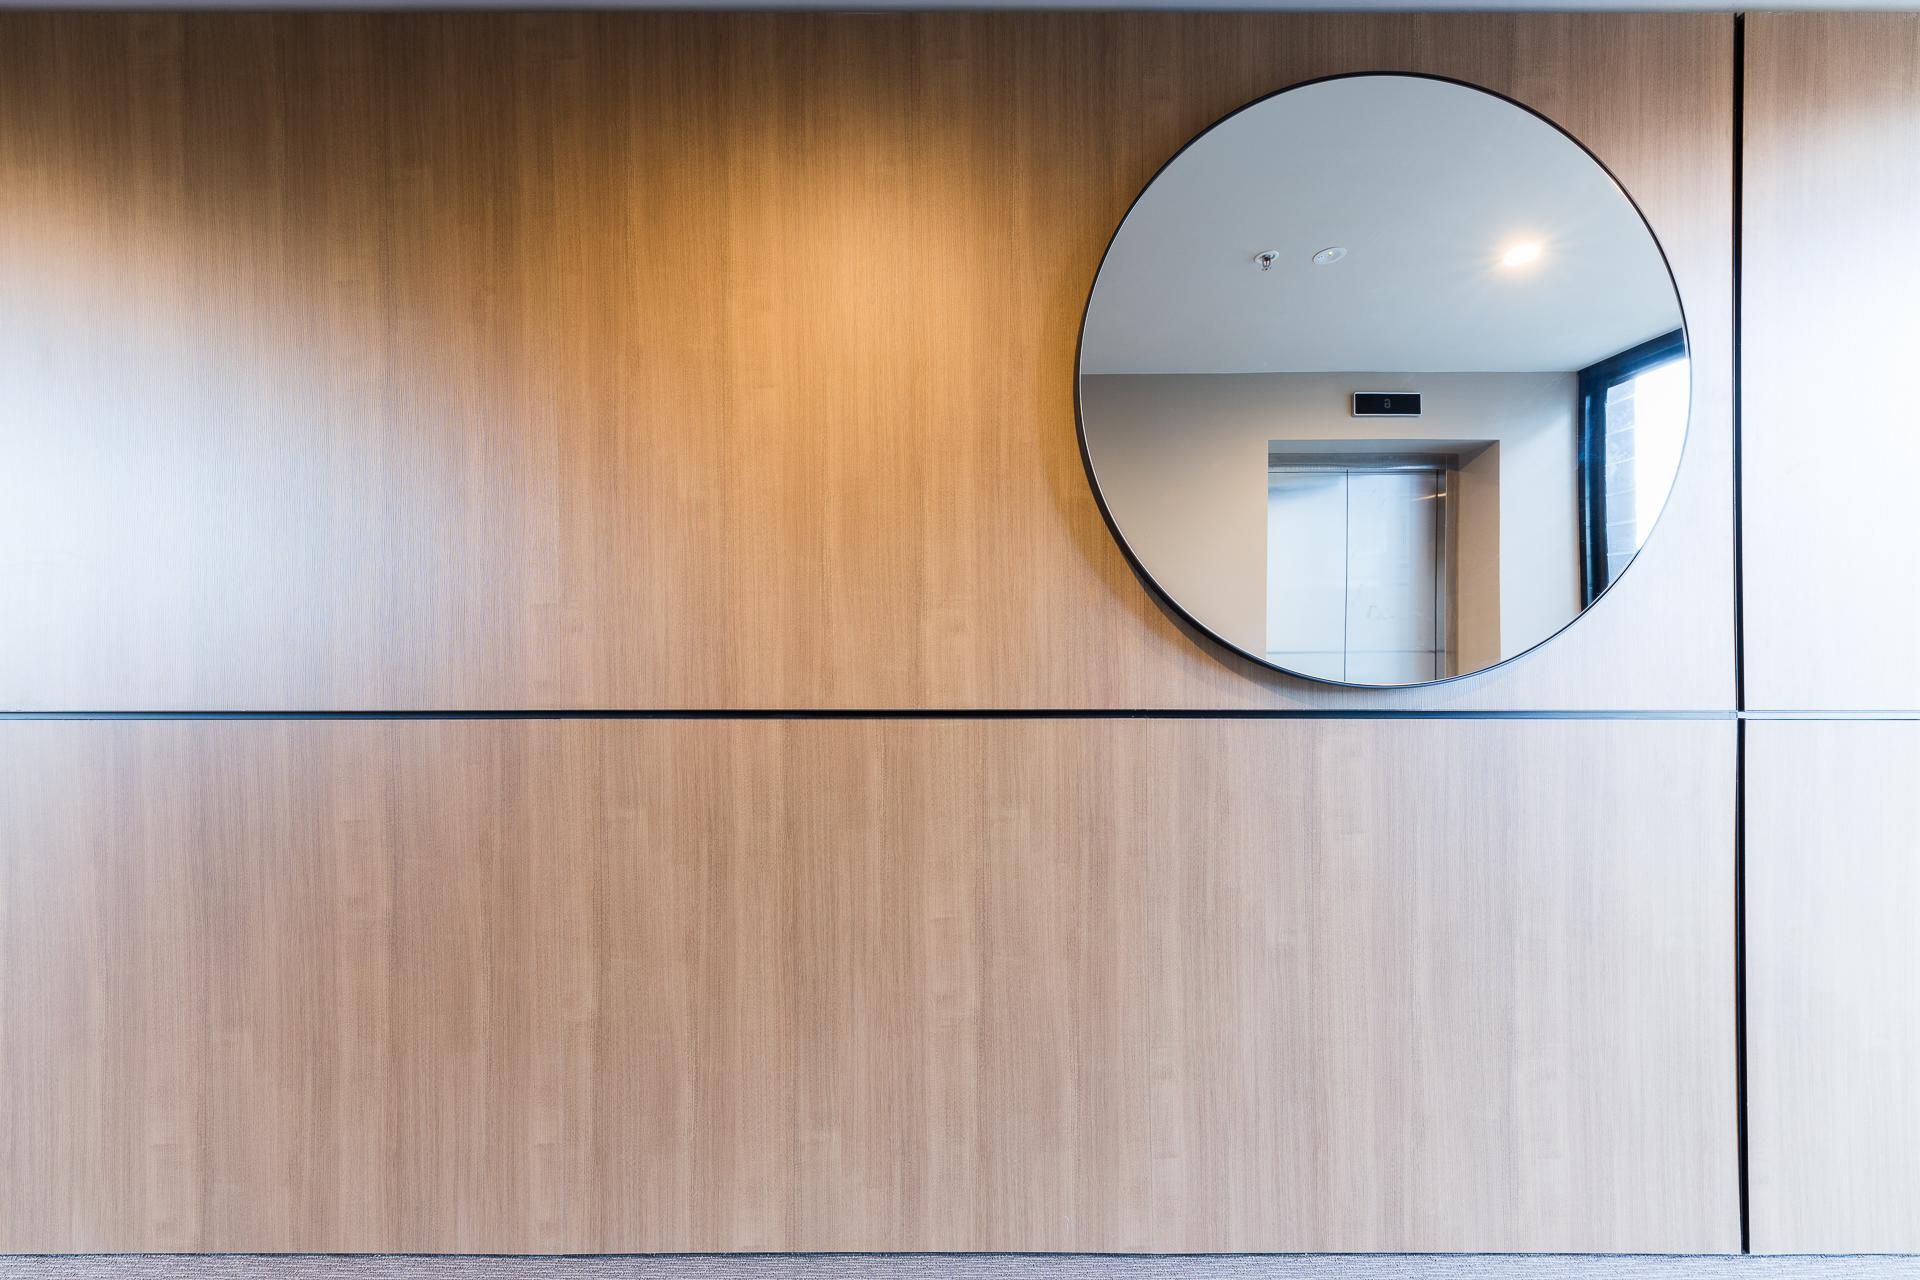 Parc Vue Multi-residential Apartments - Bundoora VIC